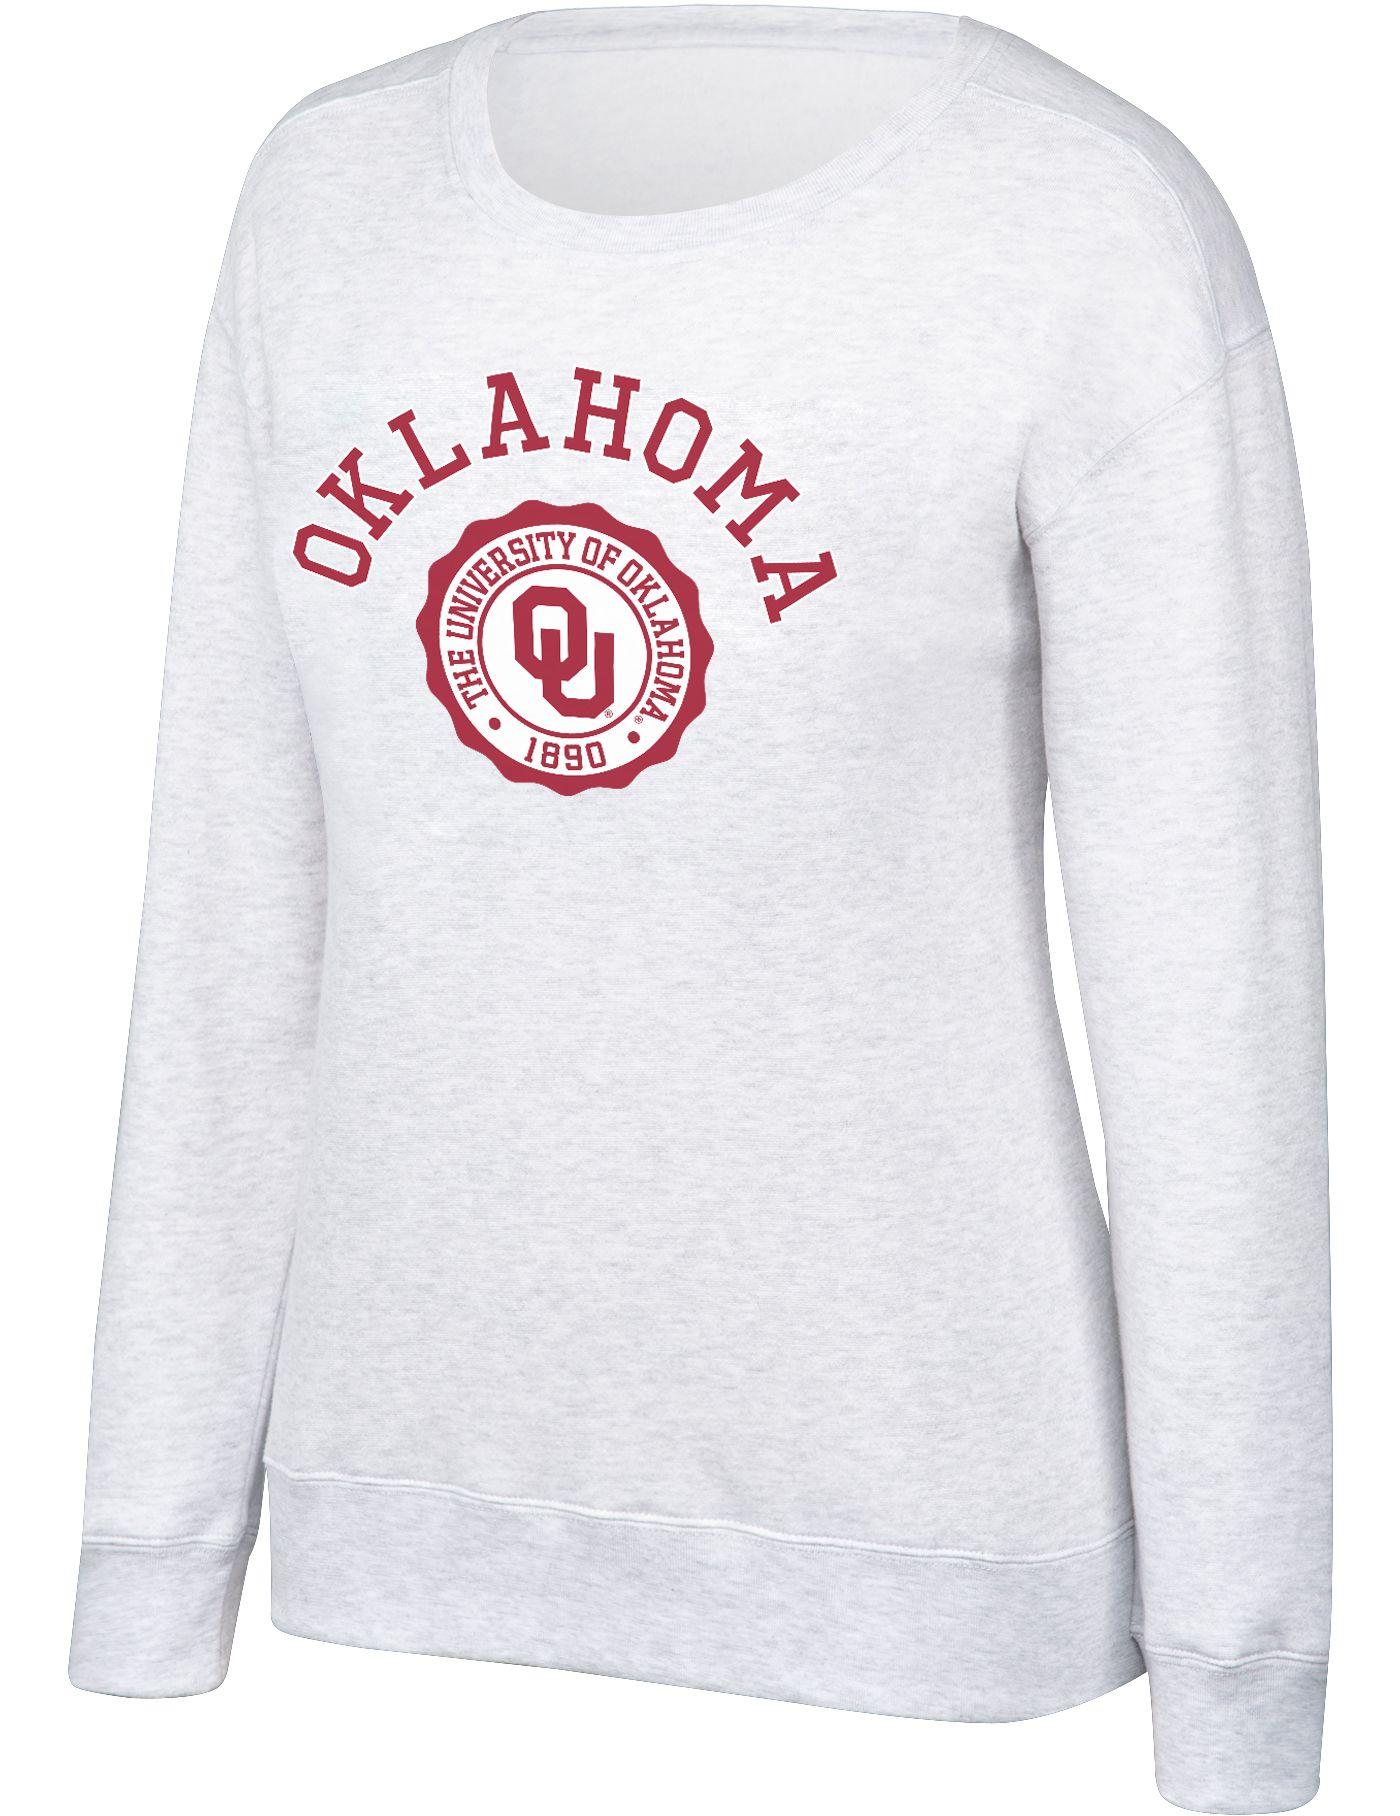 Top of the World Women's Oklahoma Sooners Grey Essential Crew Neck Sweatshirt